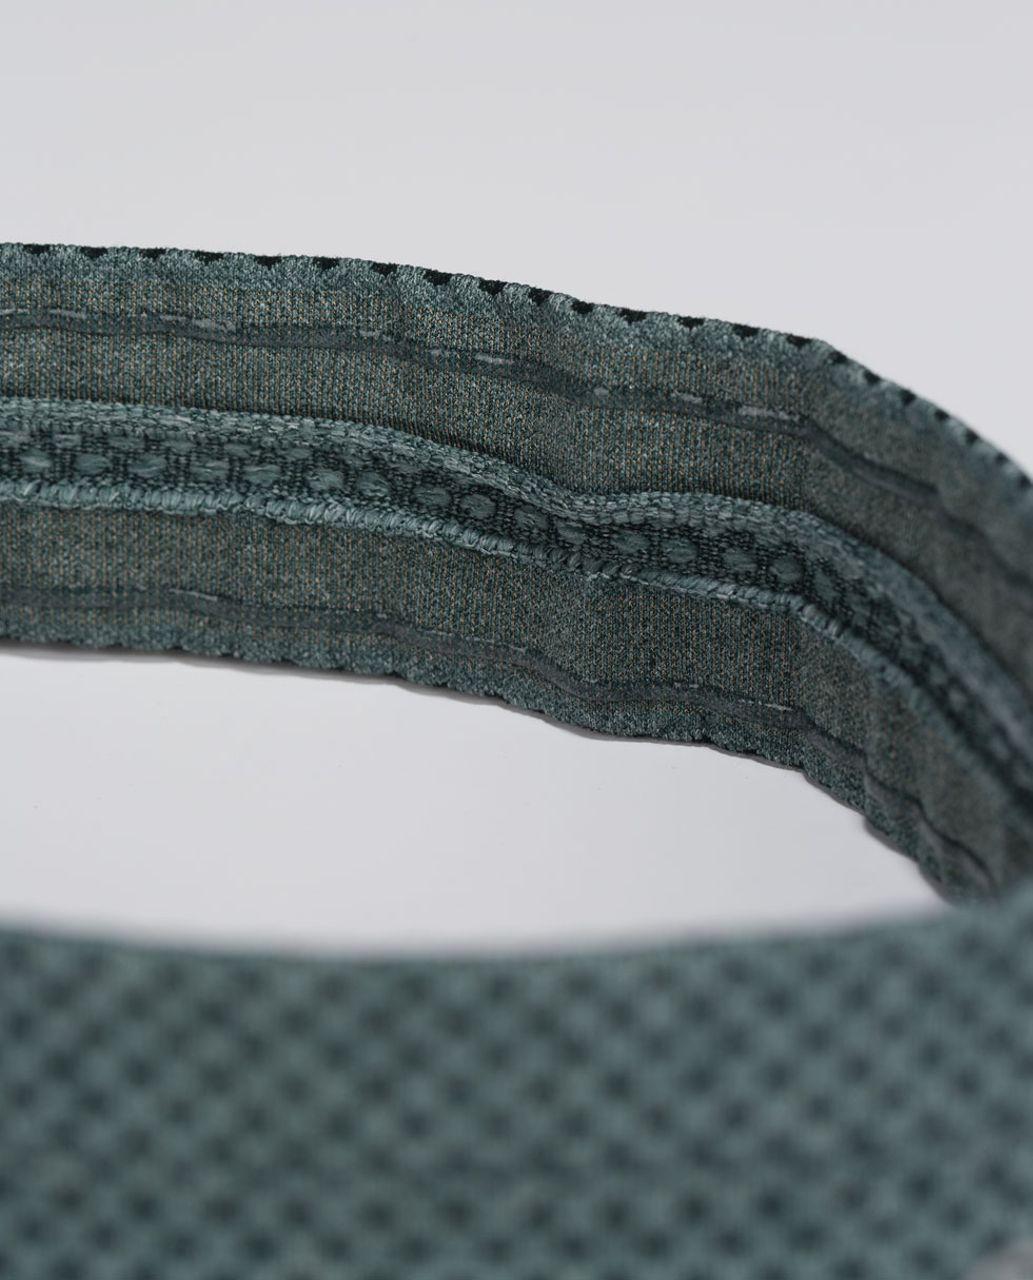 Lululemon Swiftly Headband - Heathered Fuel Green